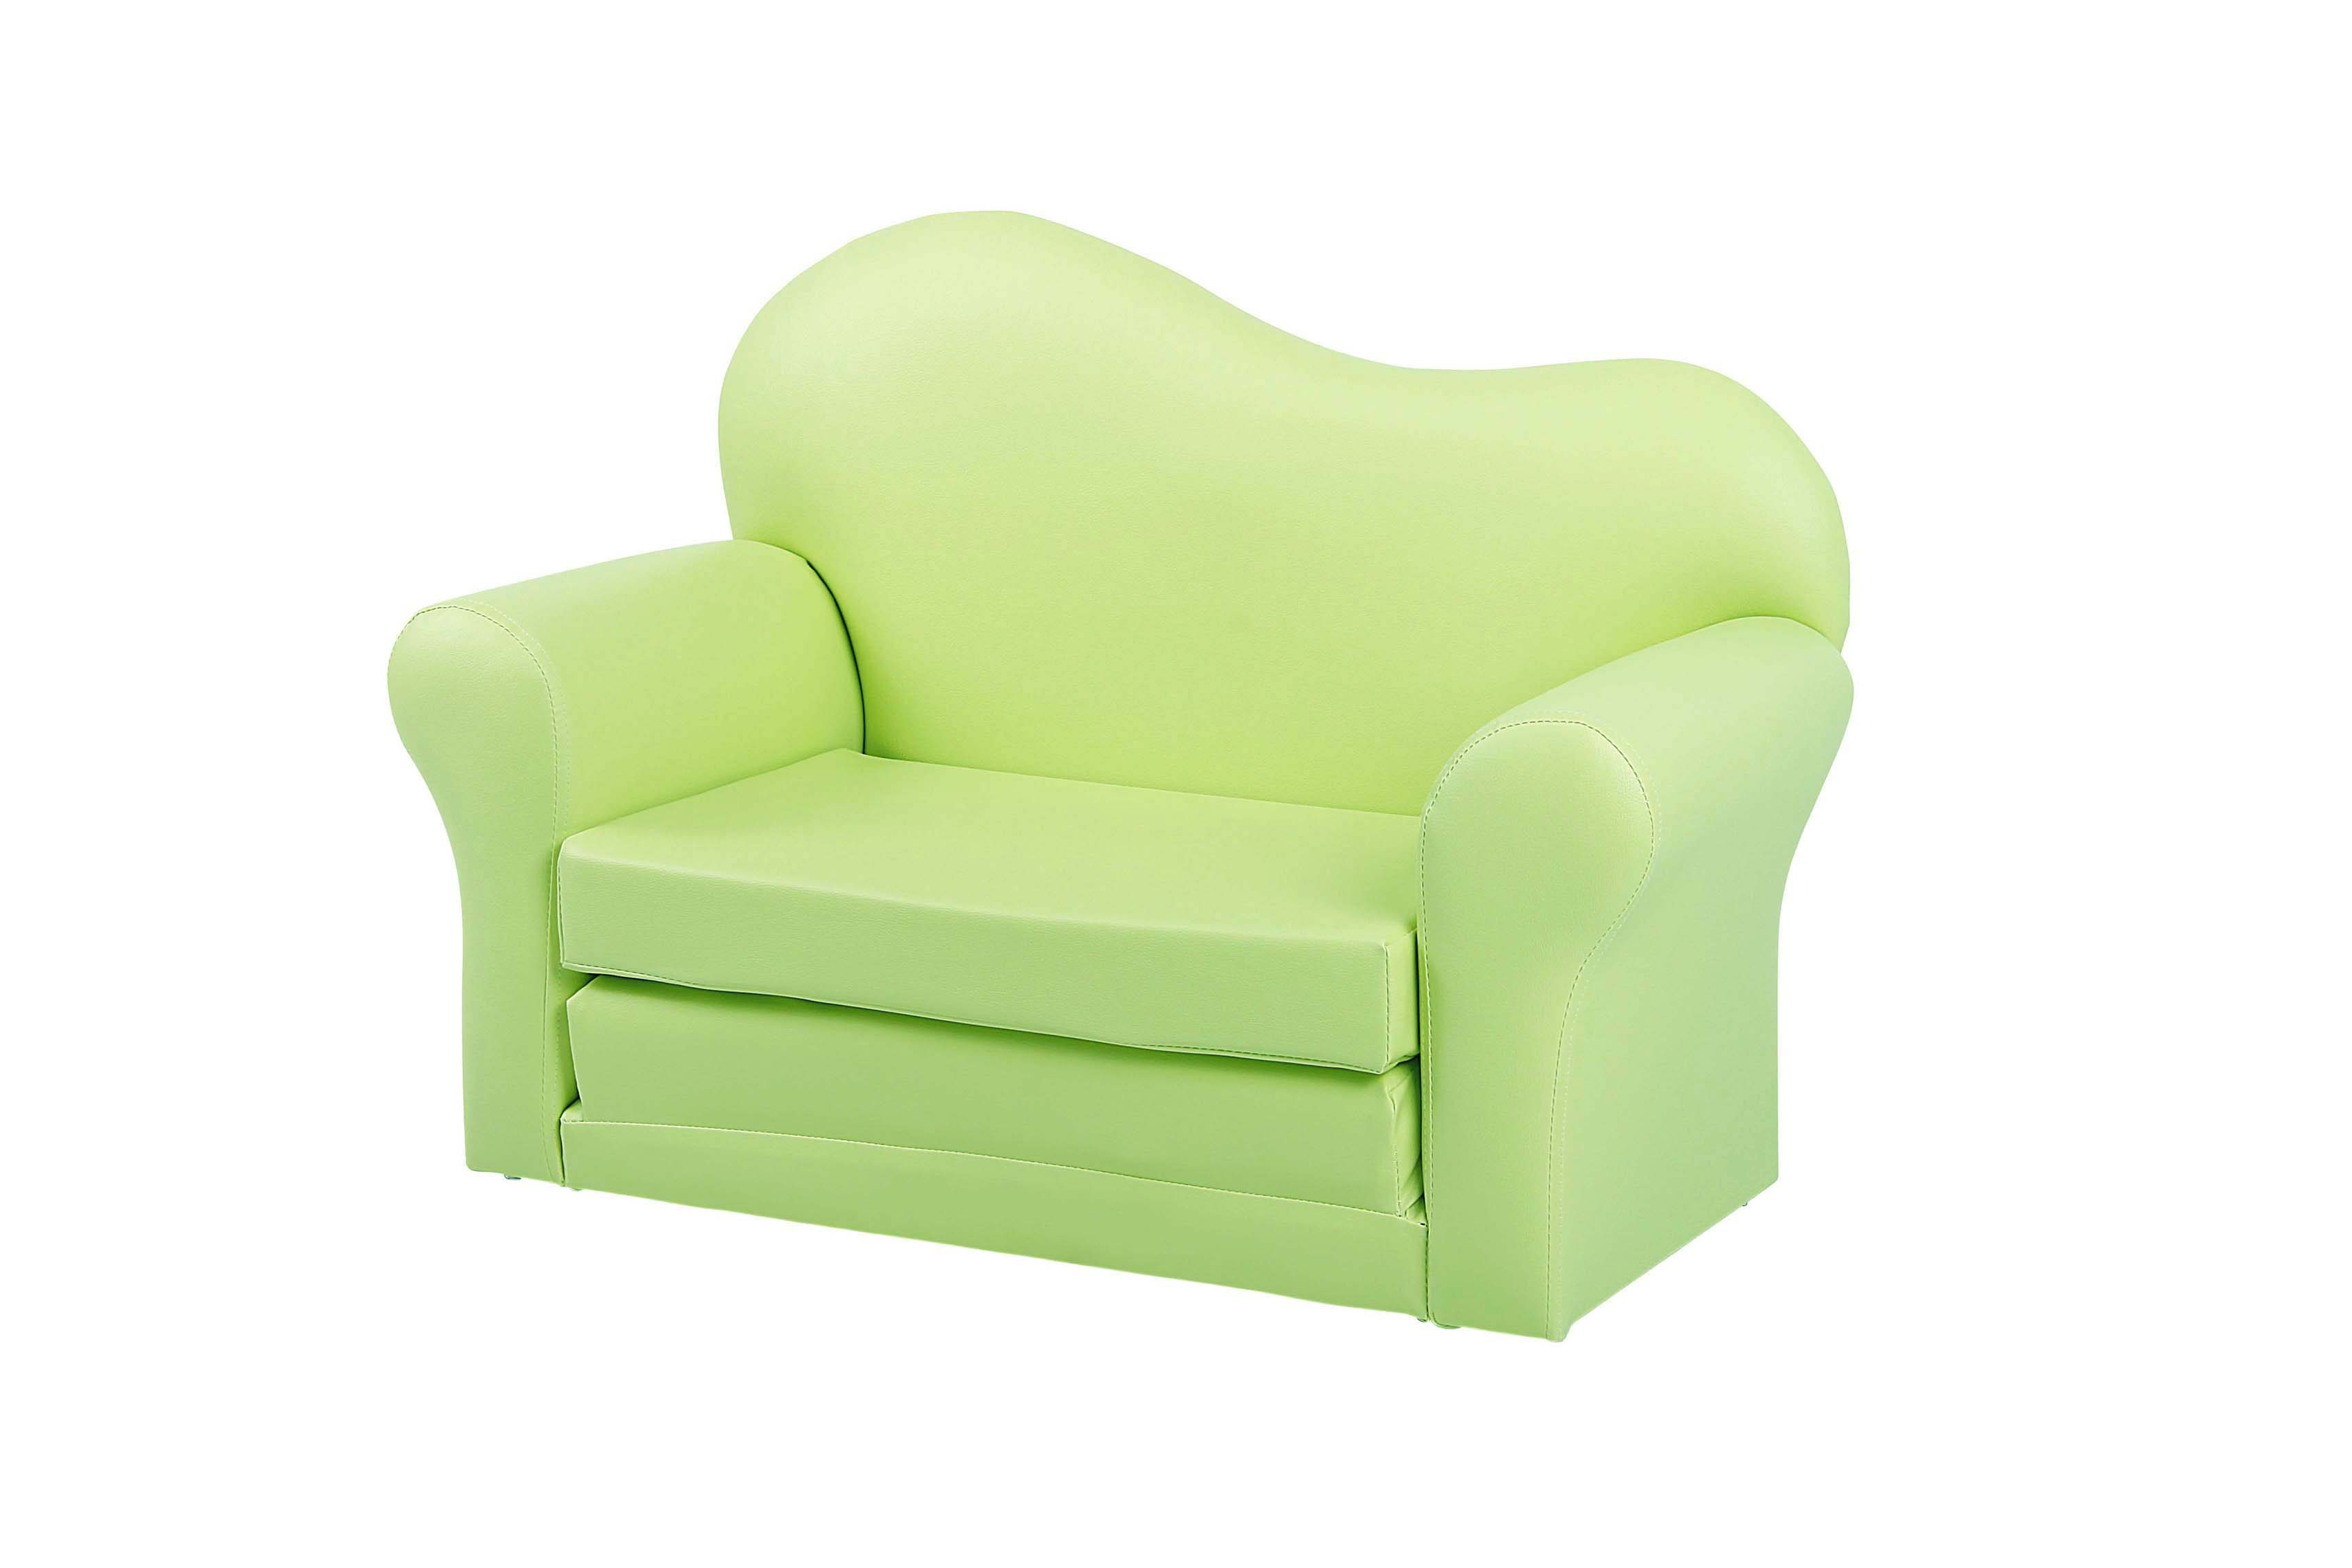 Child's Sofa Bed